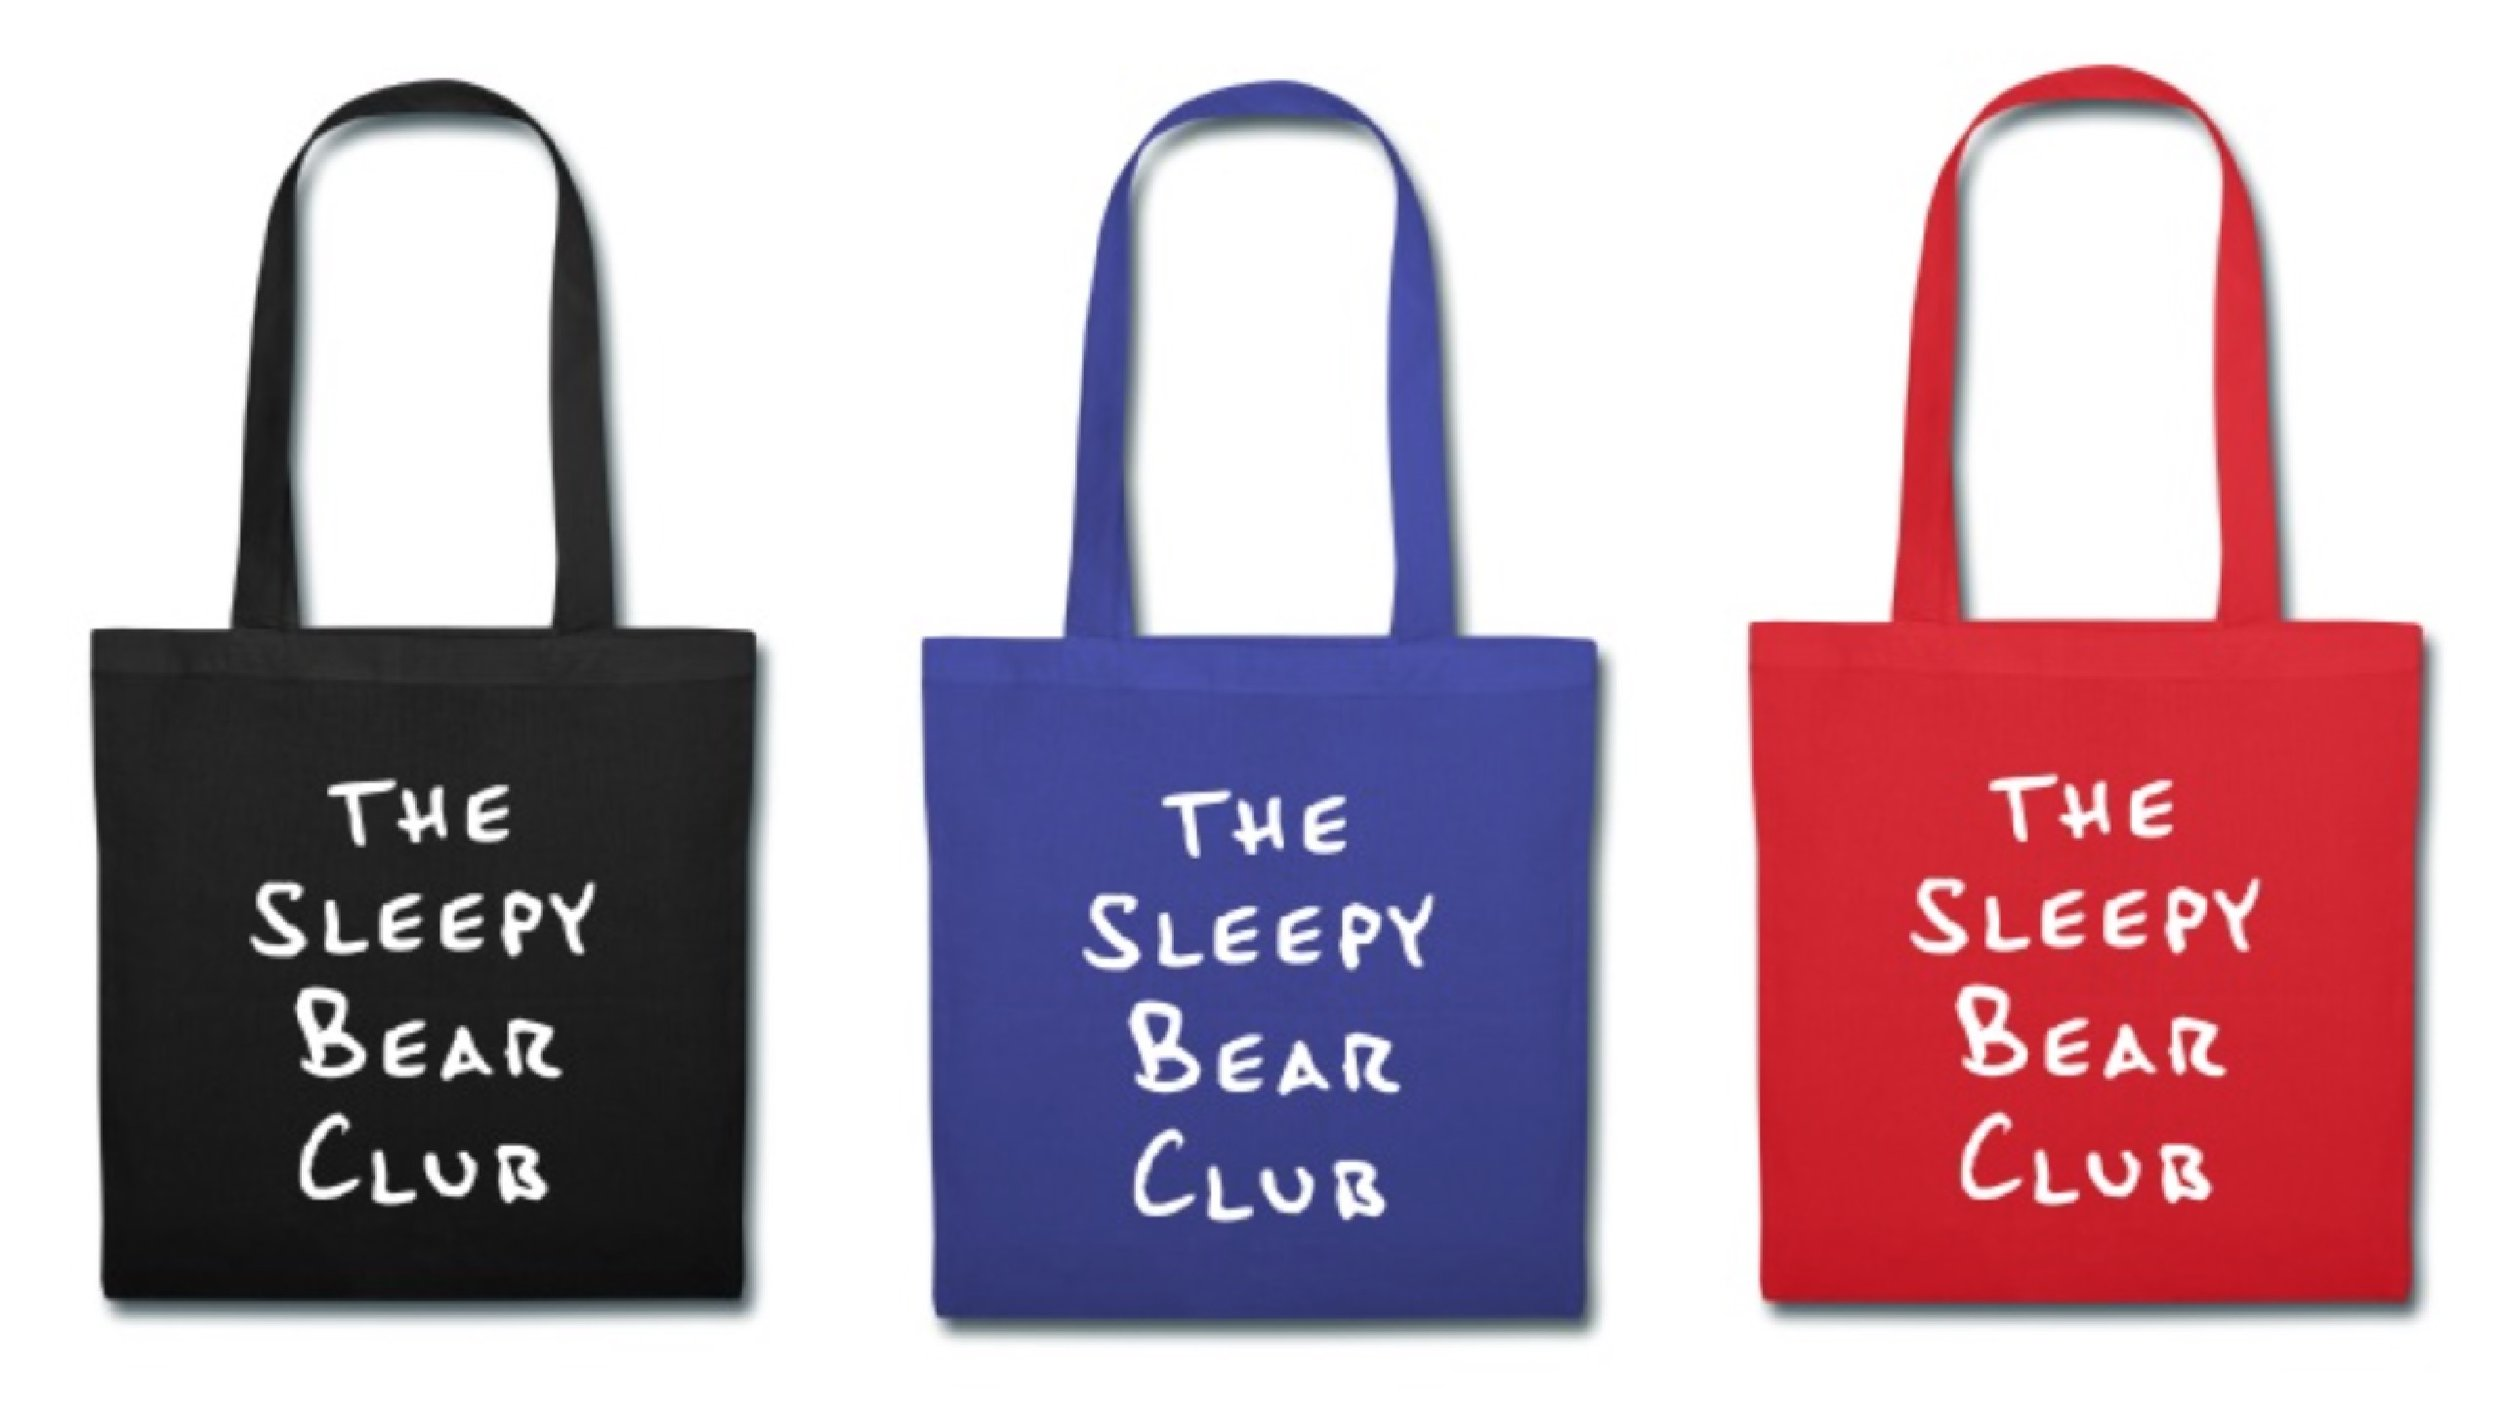 the-sleepy-bear-club-tote-bags